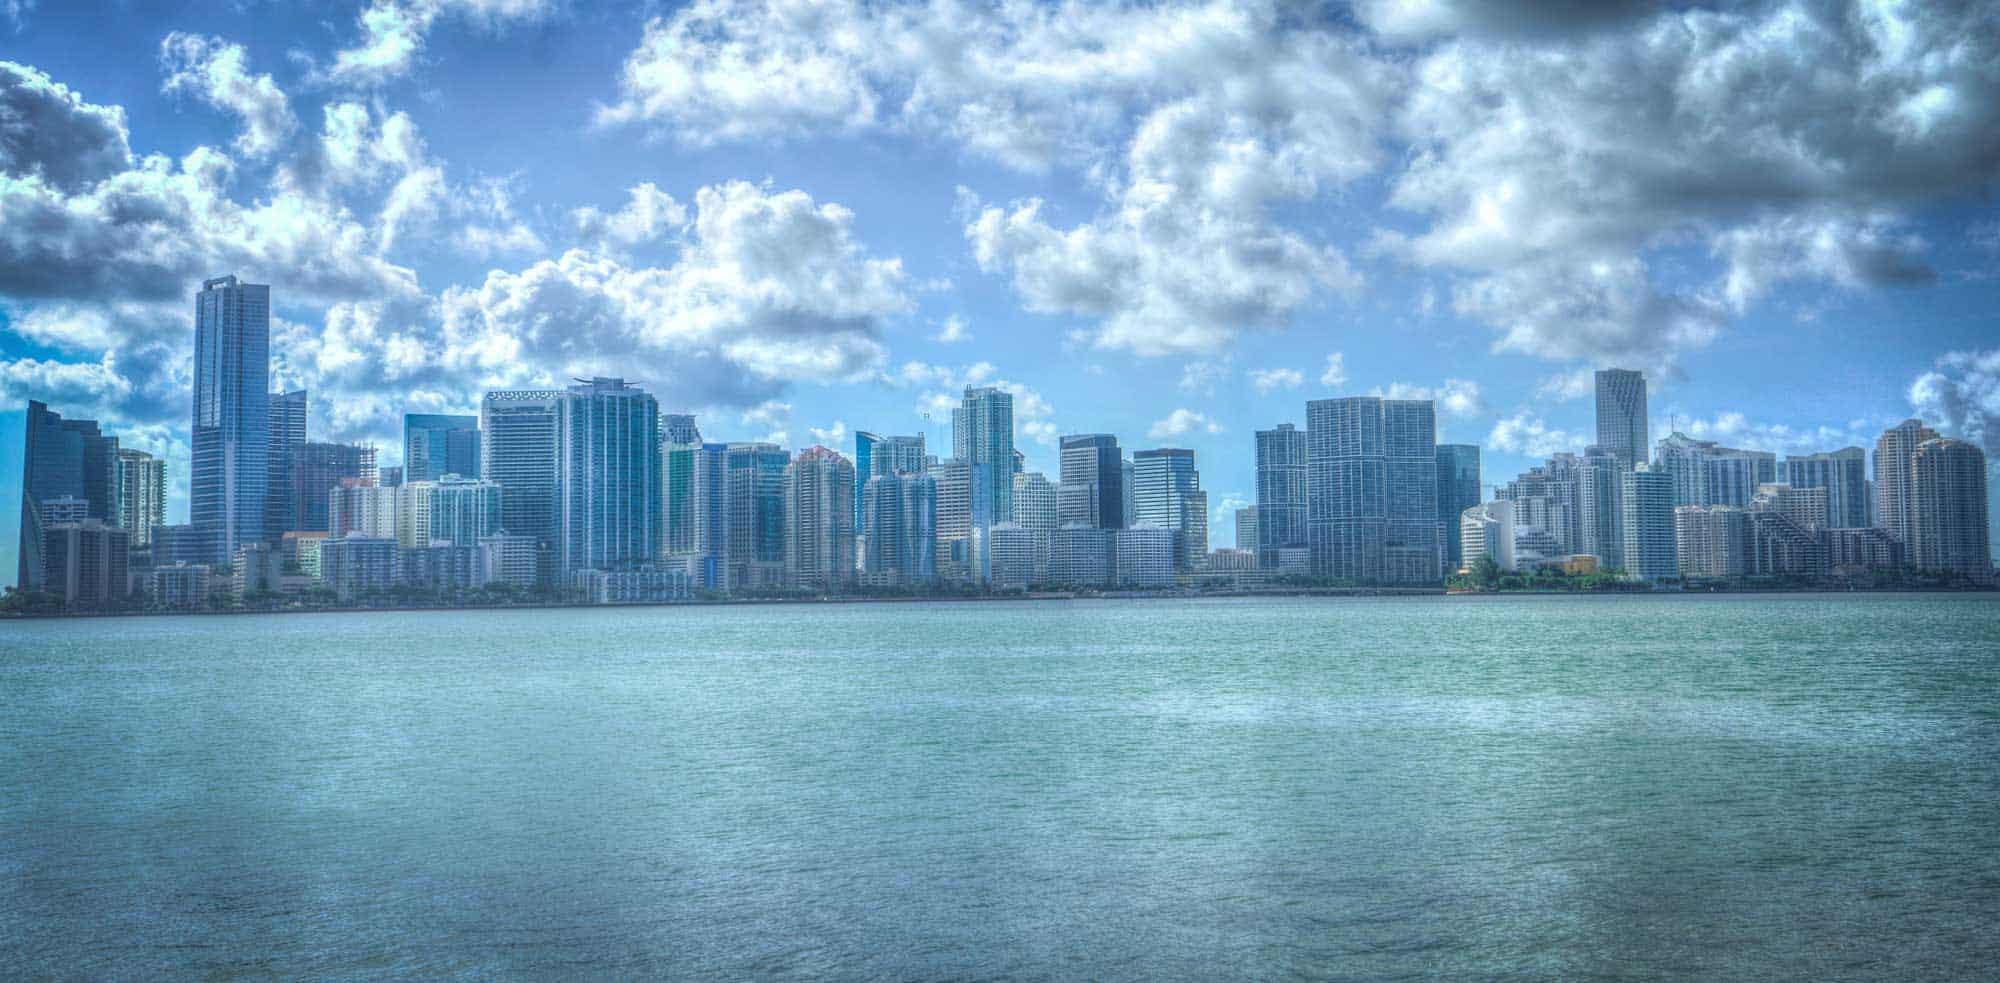 3 Days In Miami Itinerary